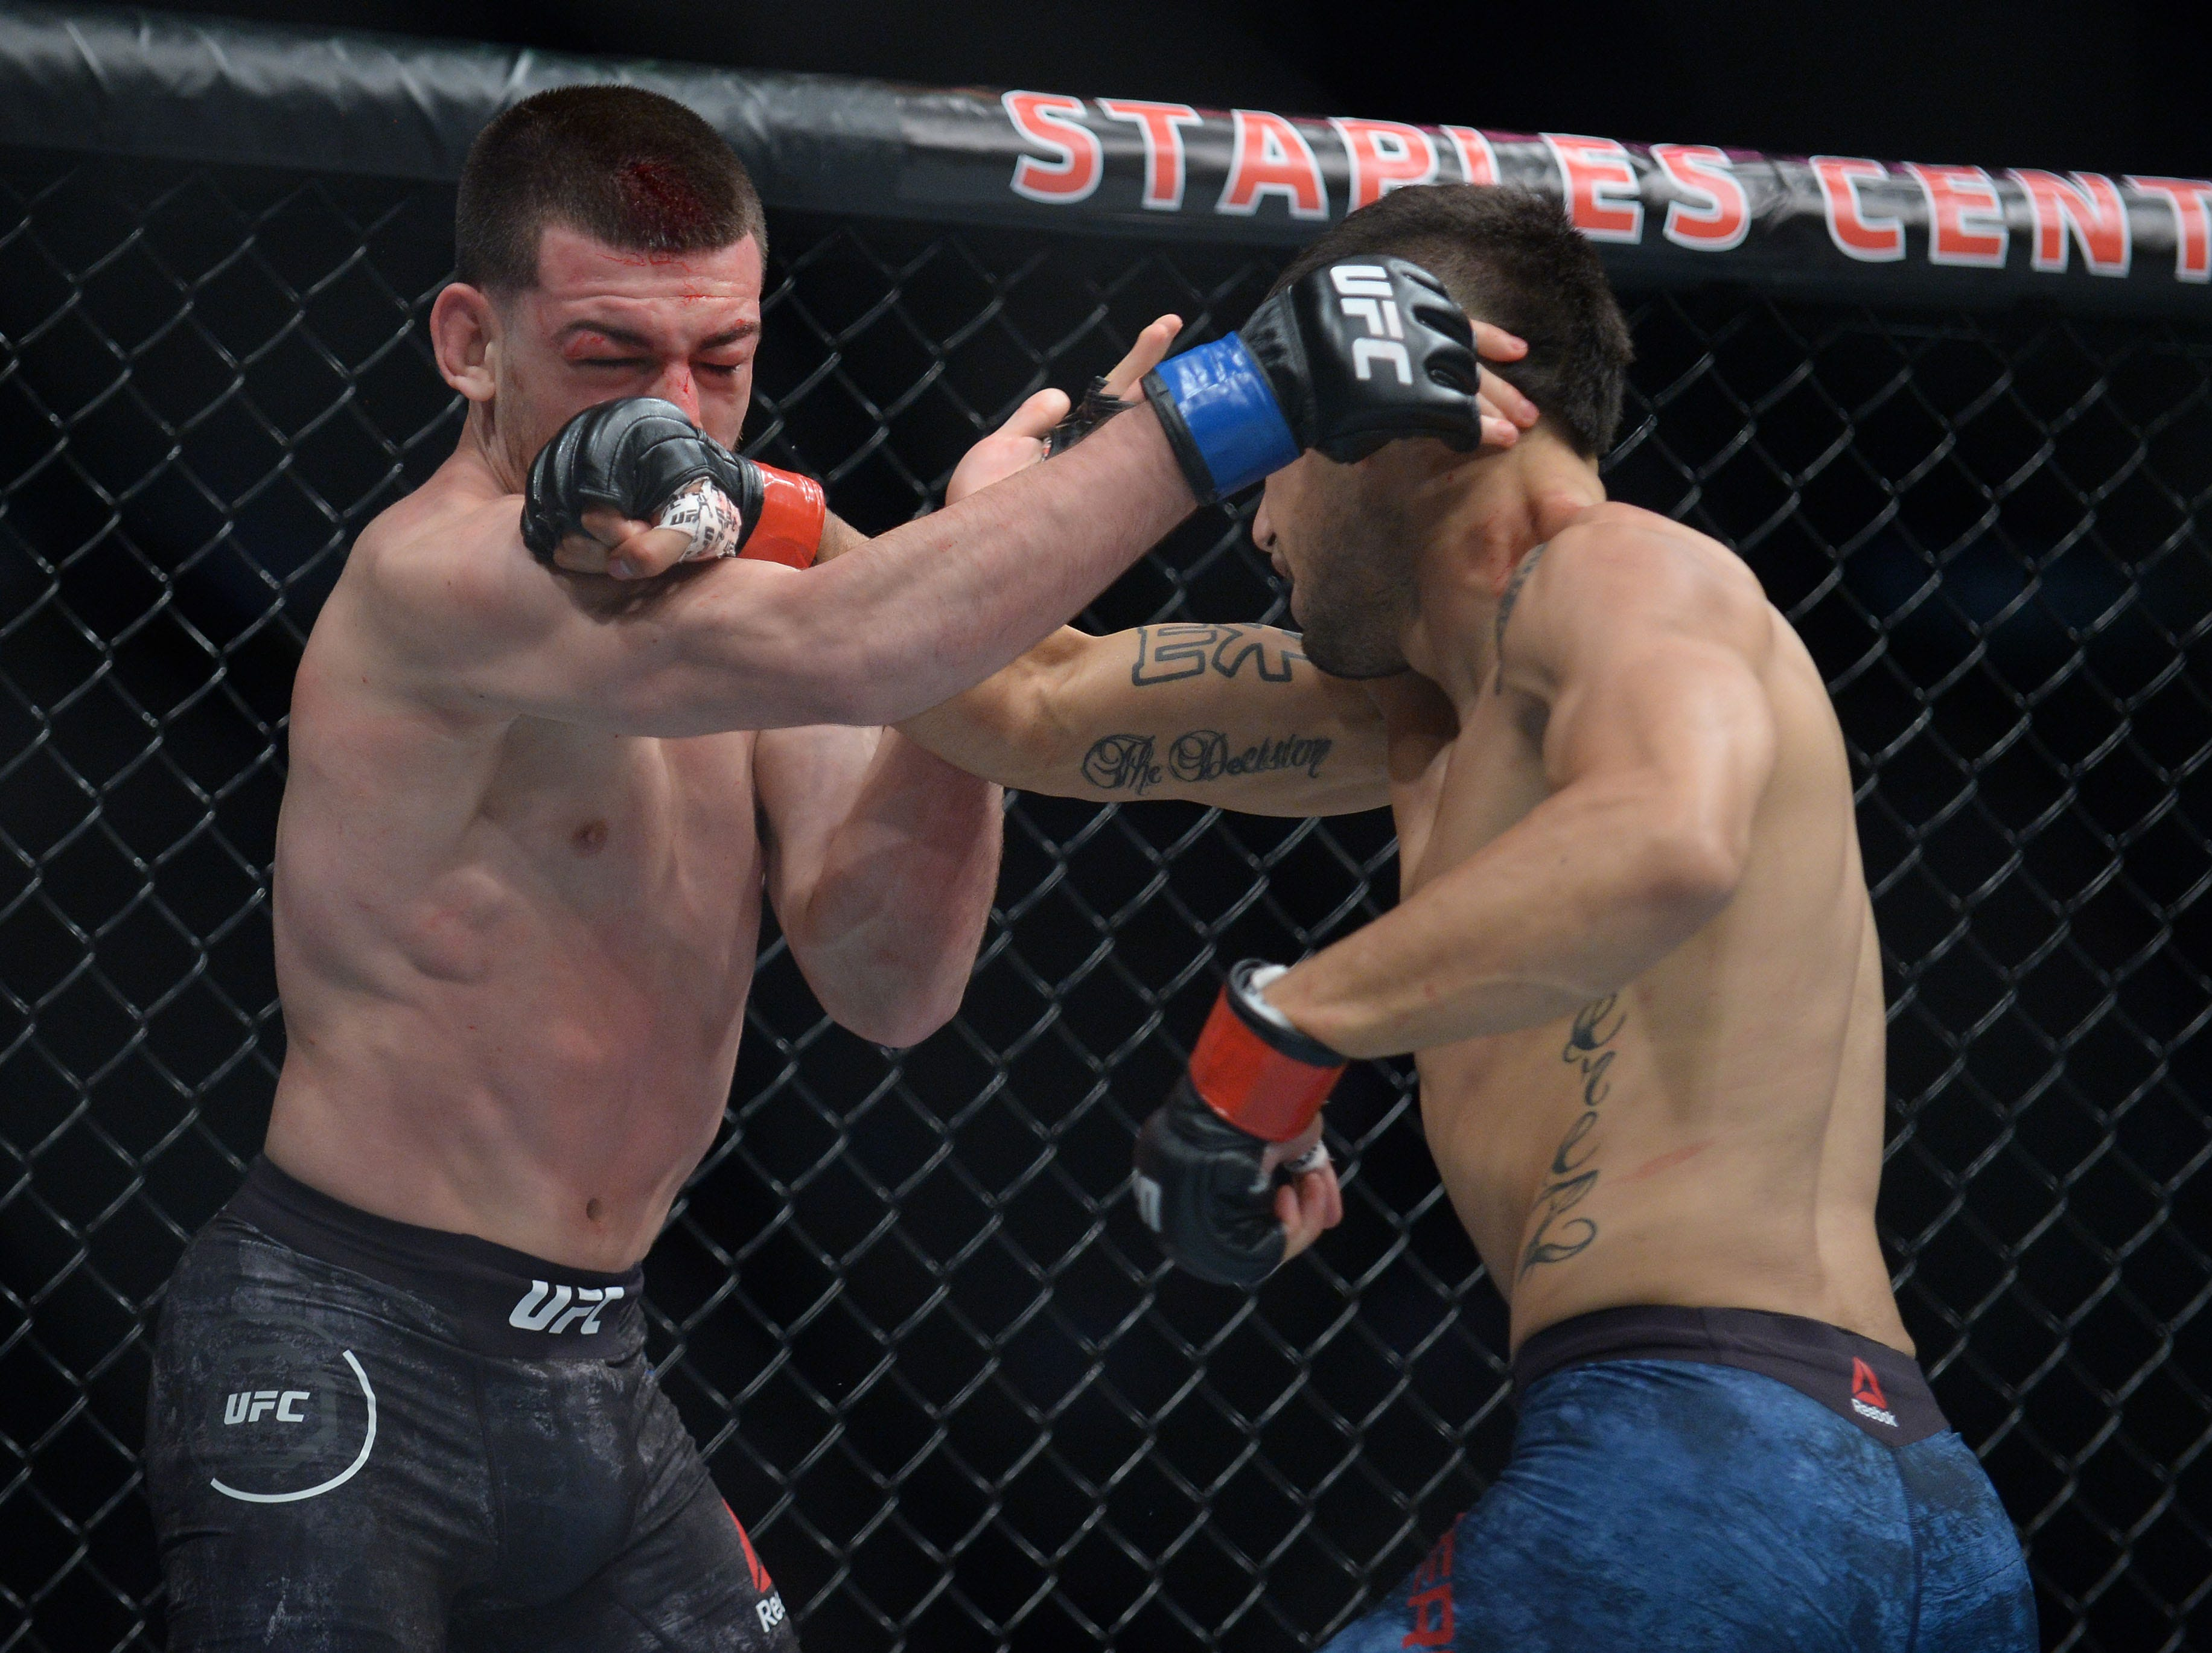 Alex Perez lands a hit as Jose Torres defends during UFC 227 at Staples Center.